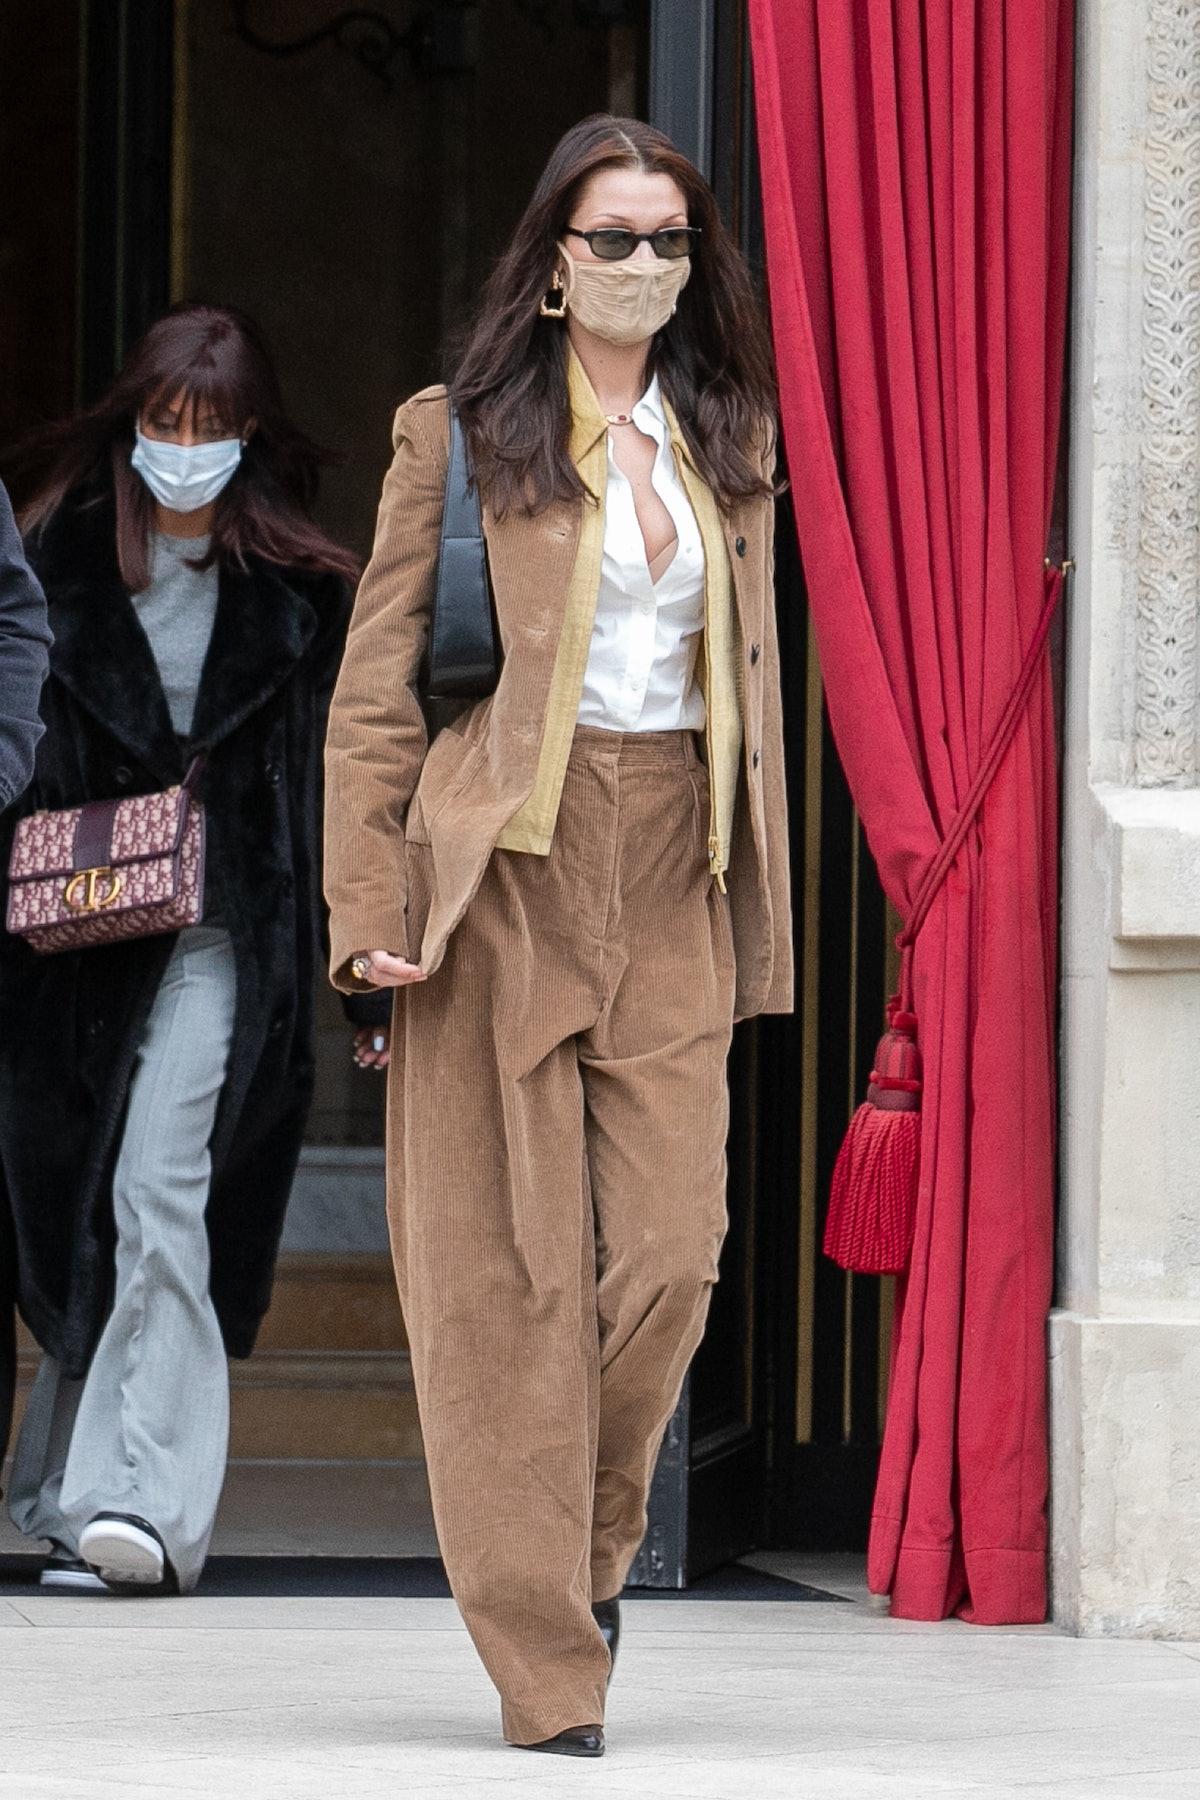 Bella Hadid wearing corduroy